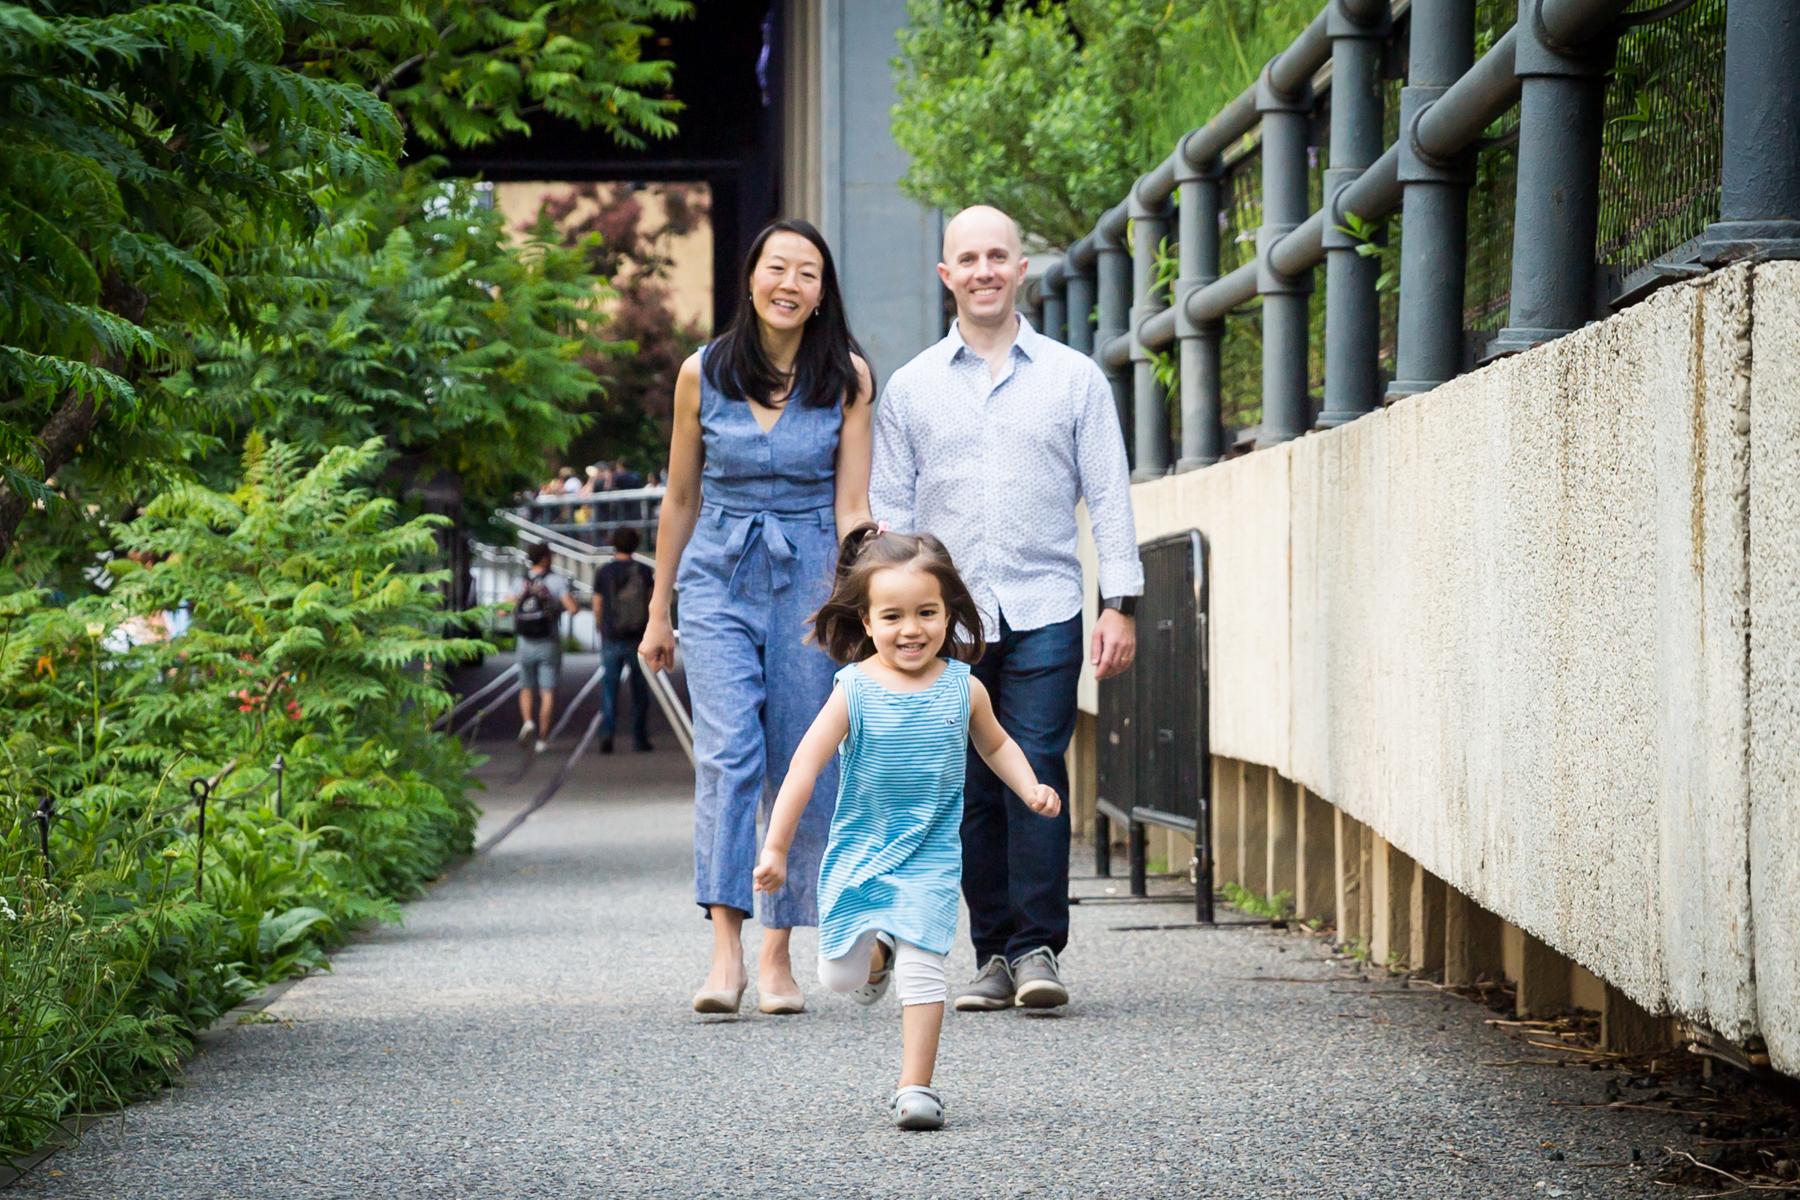 Little girl running for an article on High Line family portrait tips